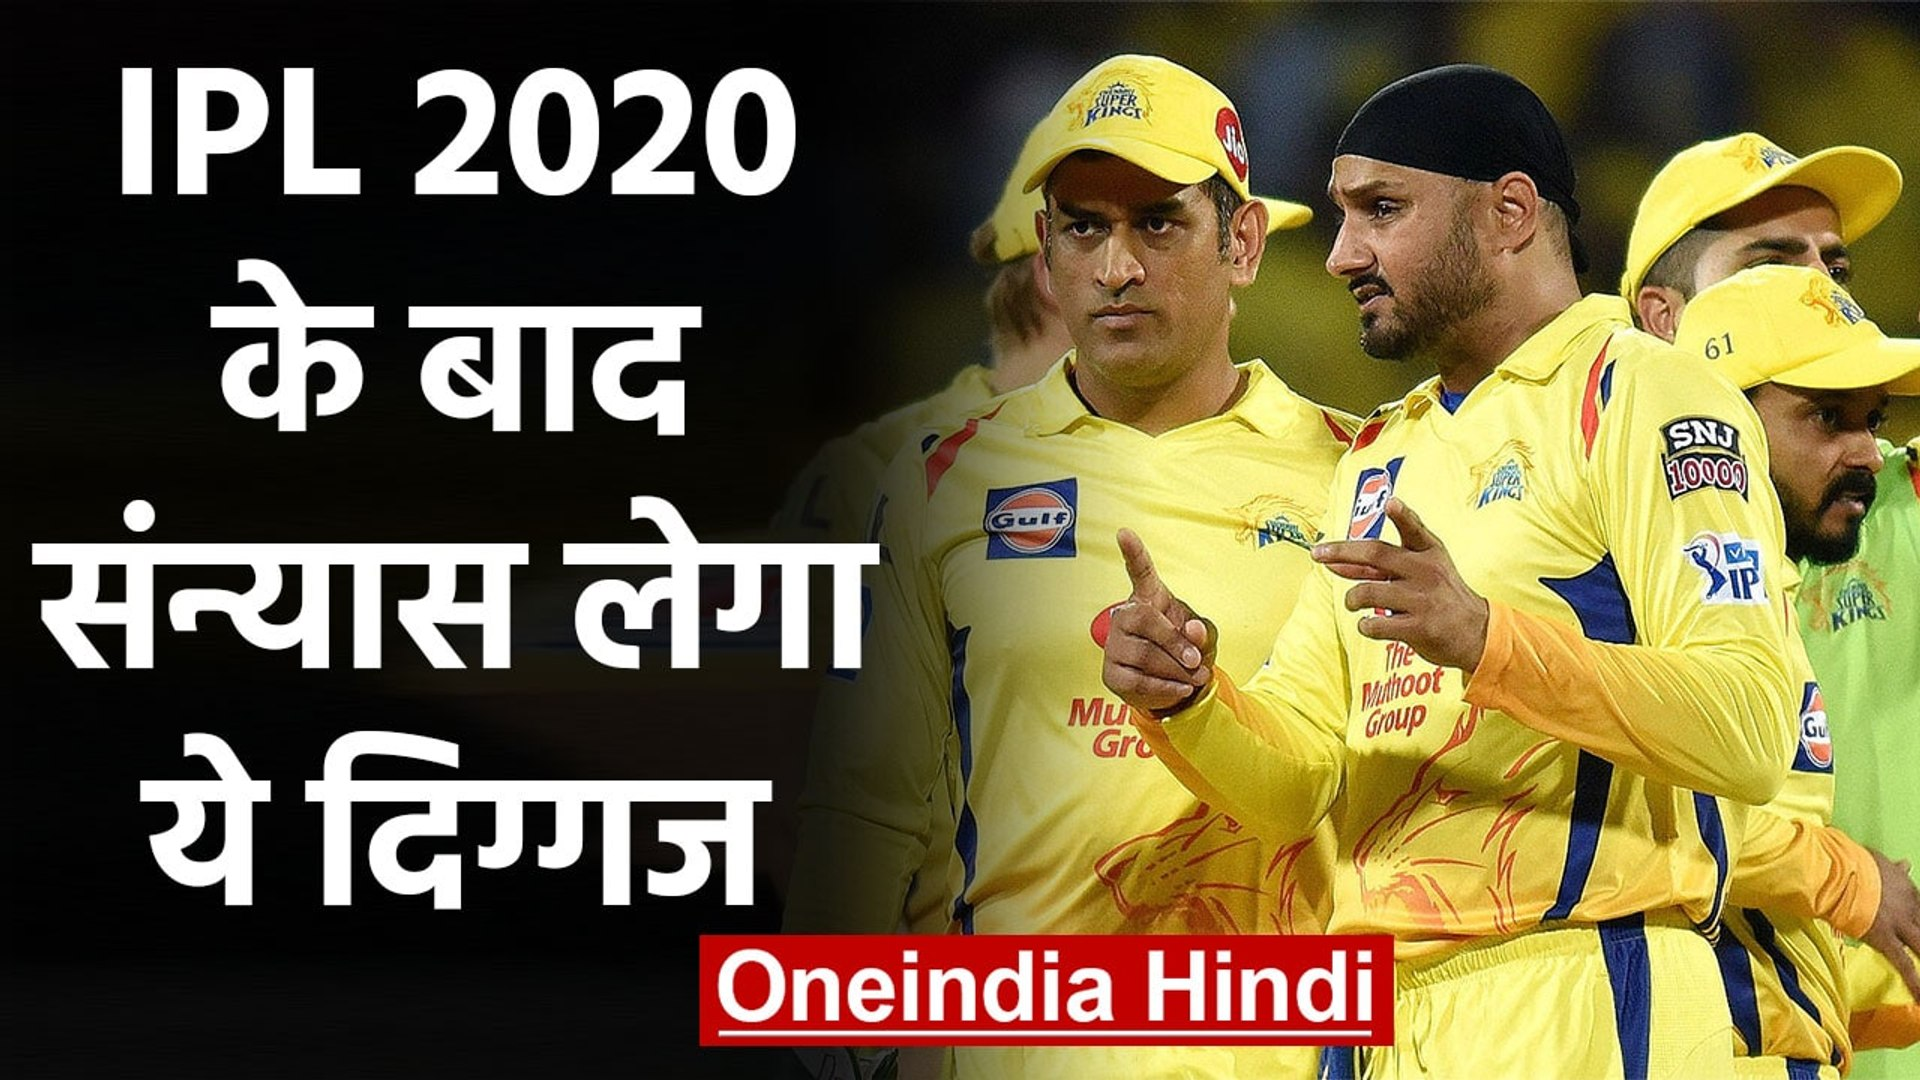 Harbhajan Singh may retire from all forms of cricket during IPL 2020 |वनइंडिया हिंदी